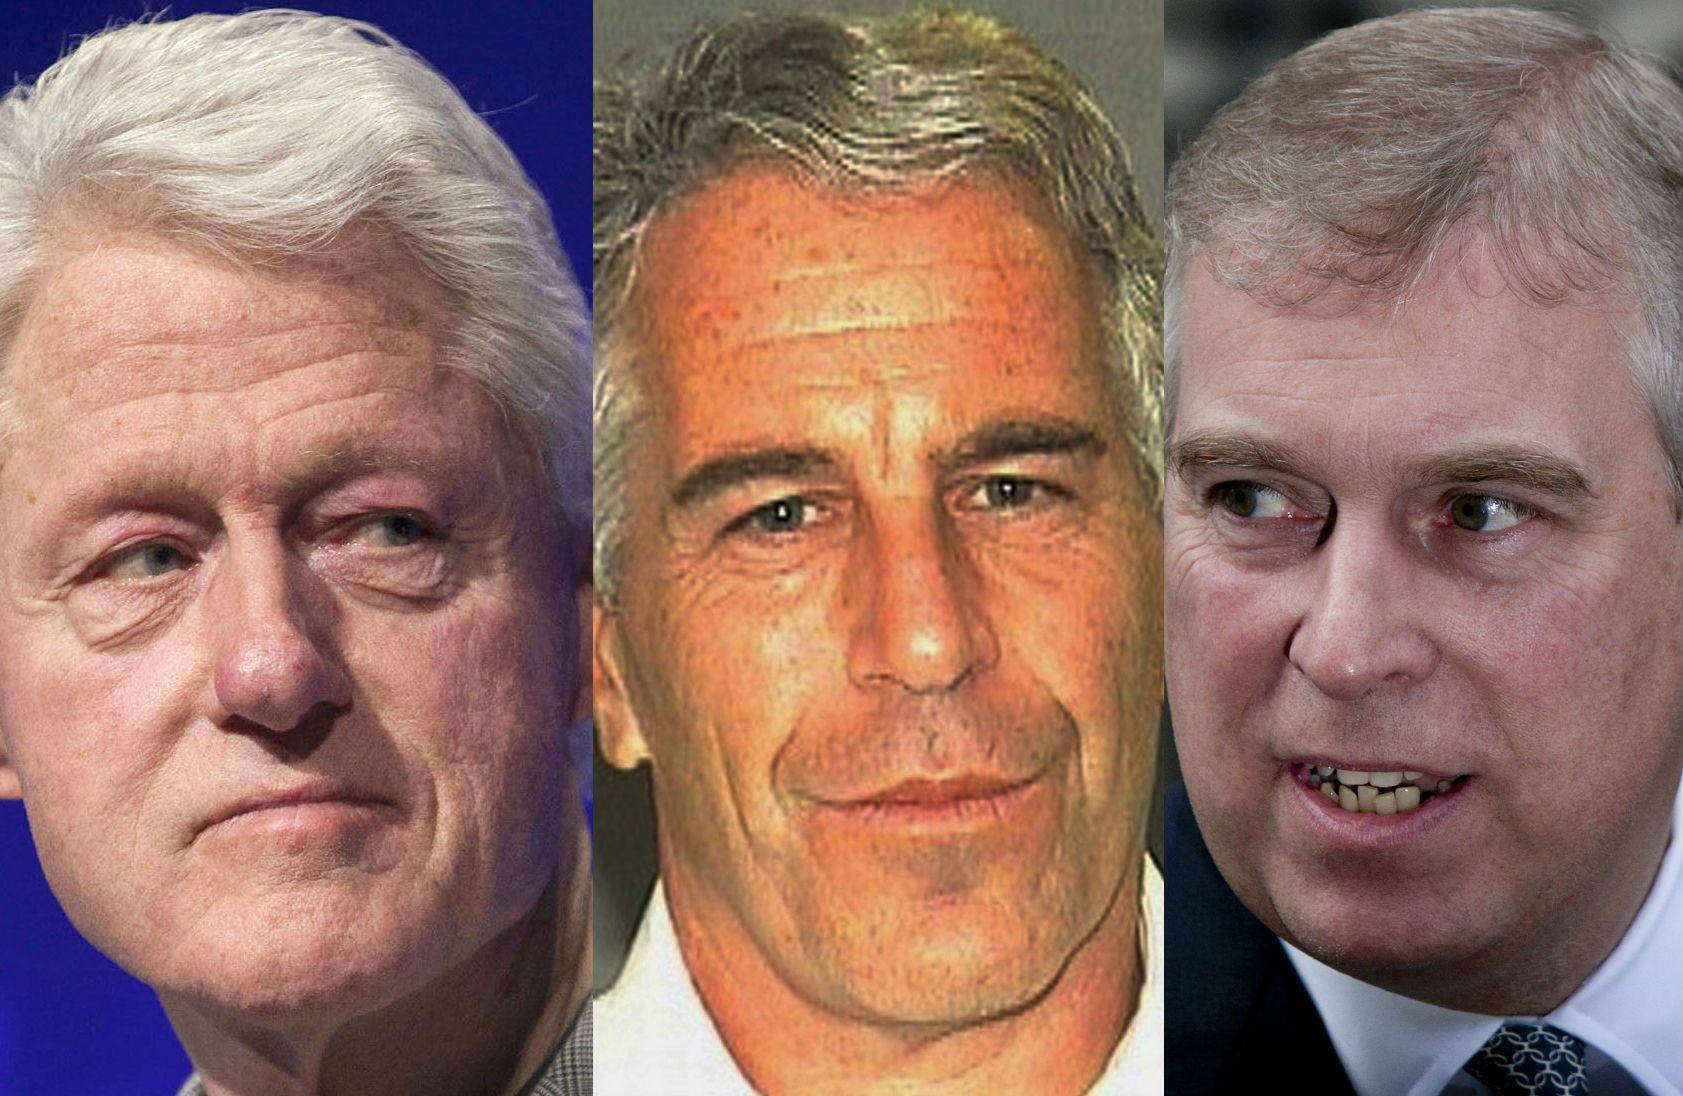 Clinton and Epstein